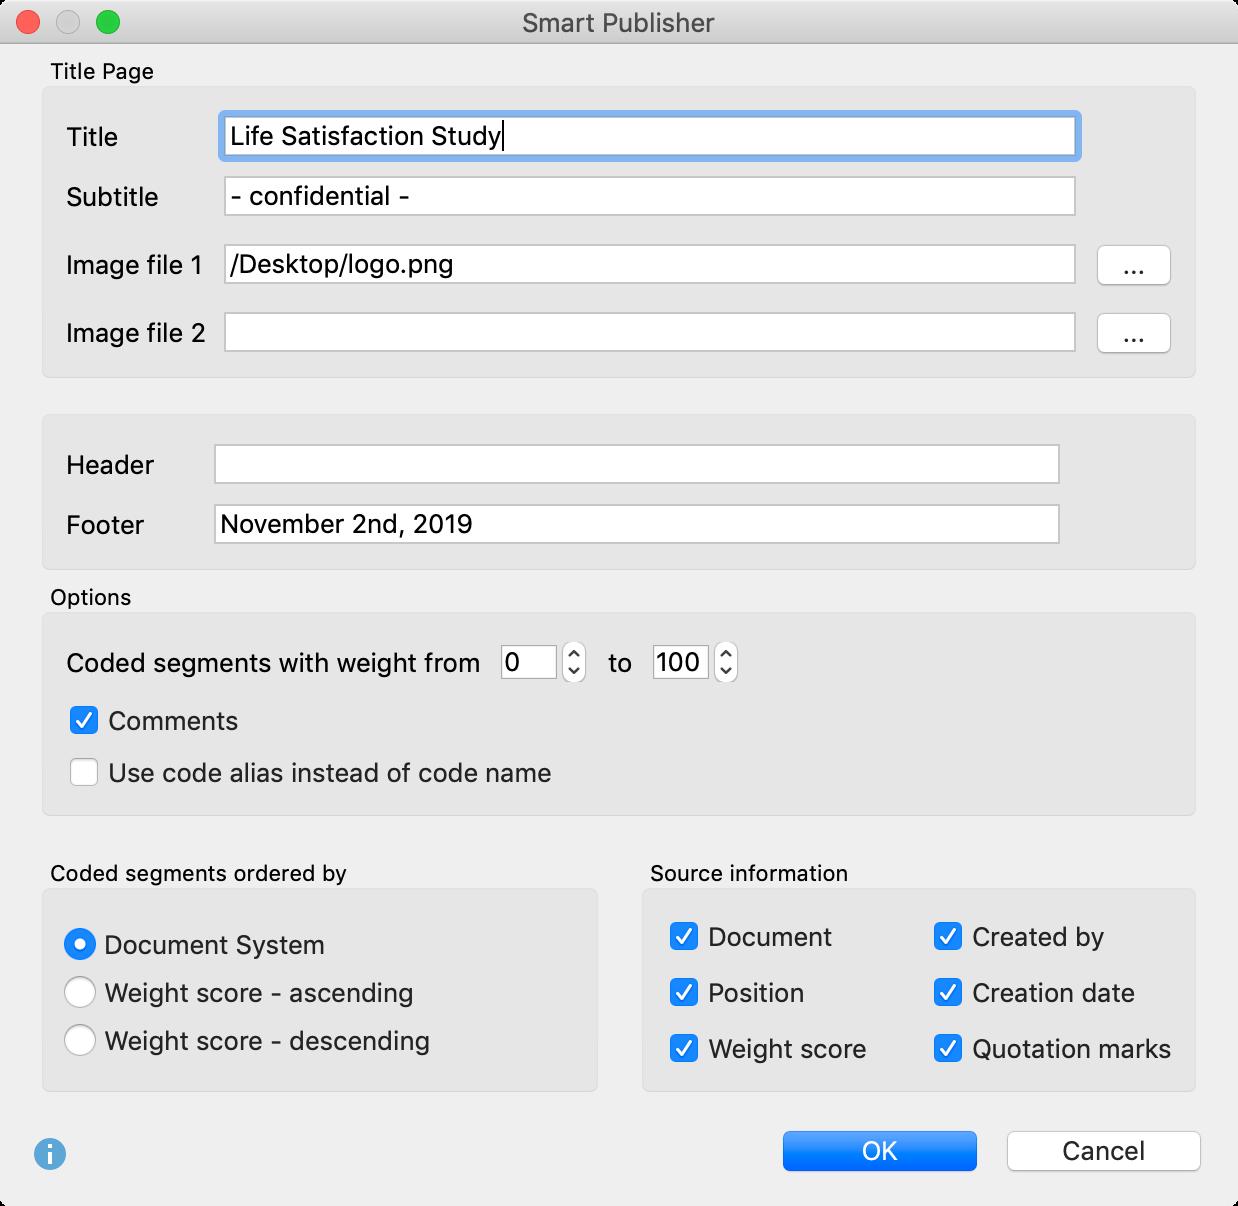 Smart Publisher settings